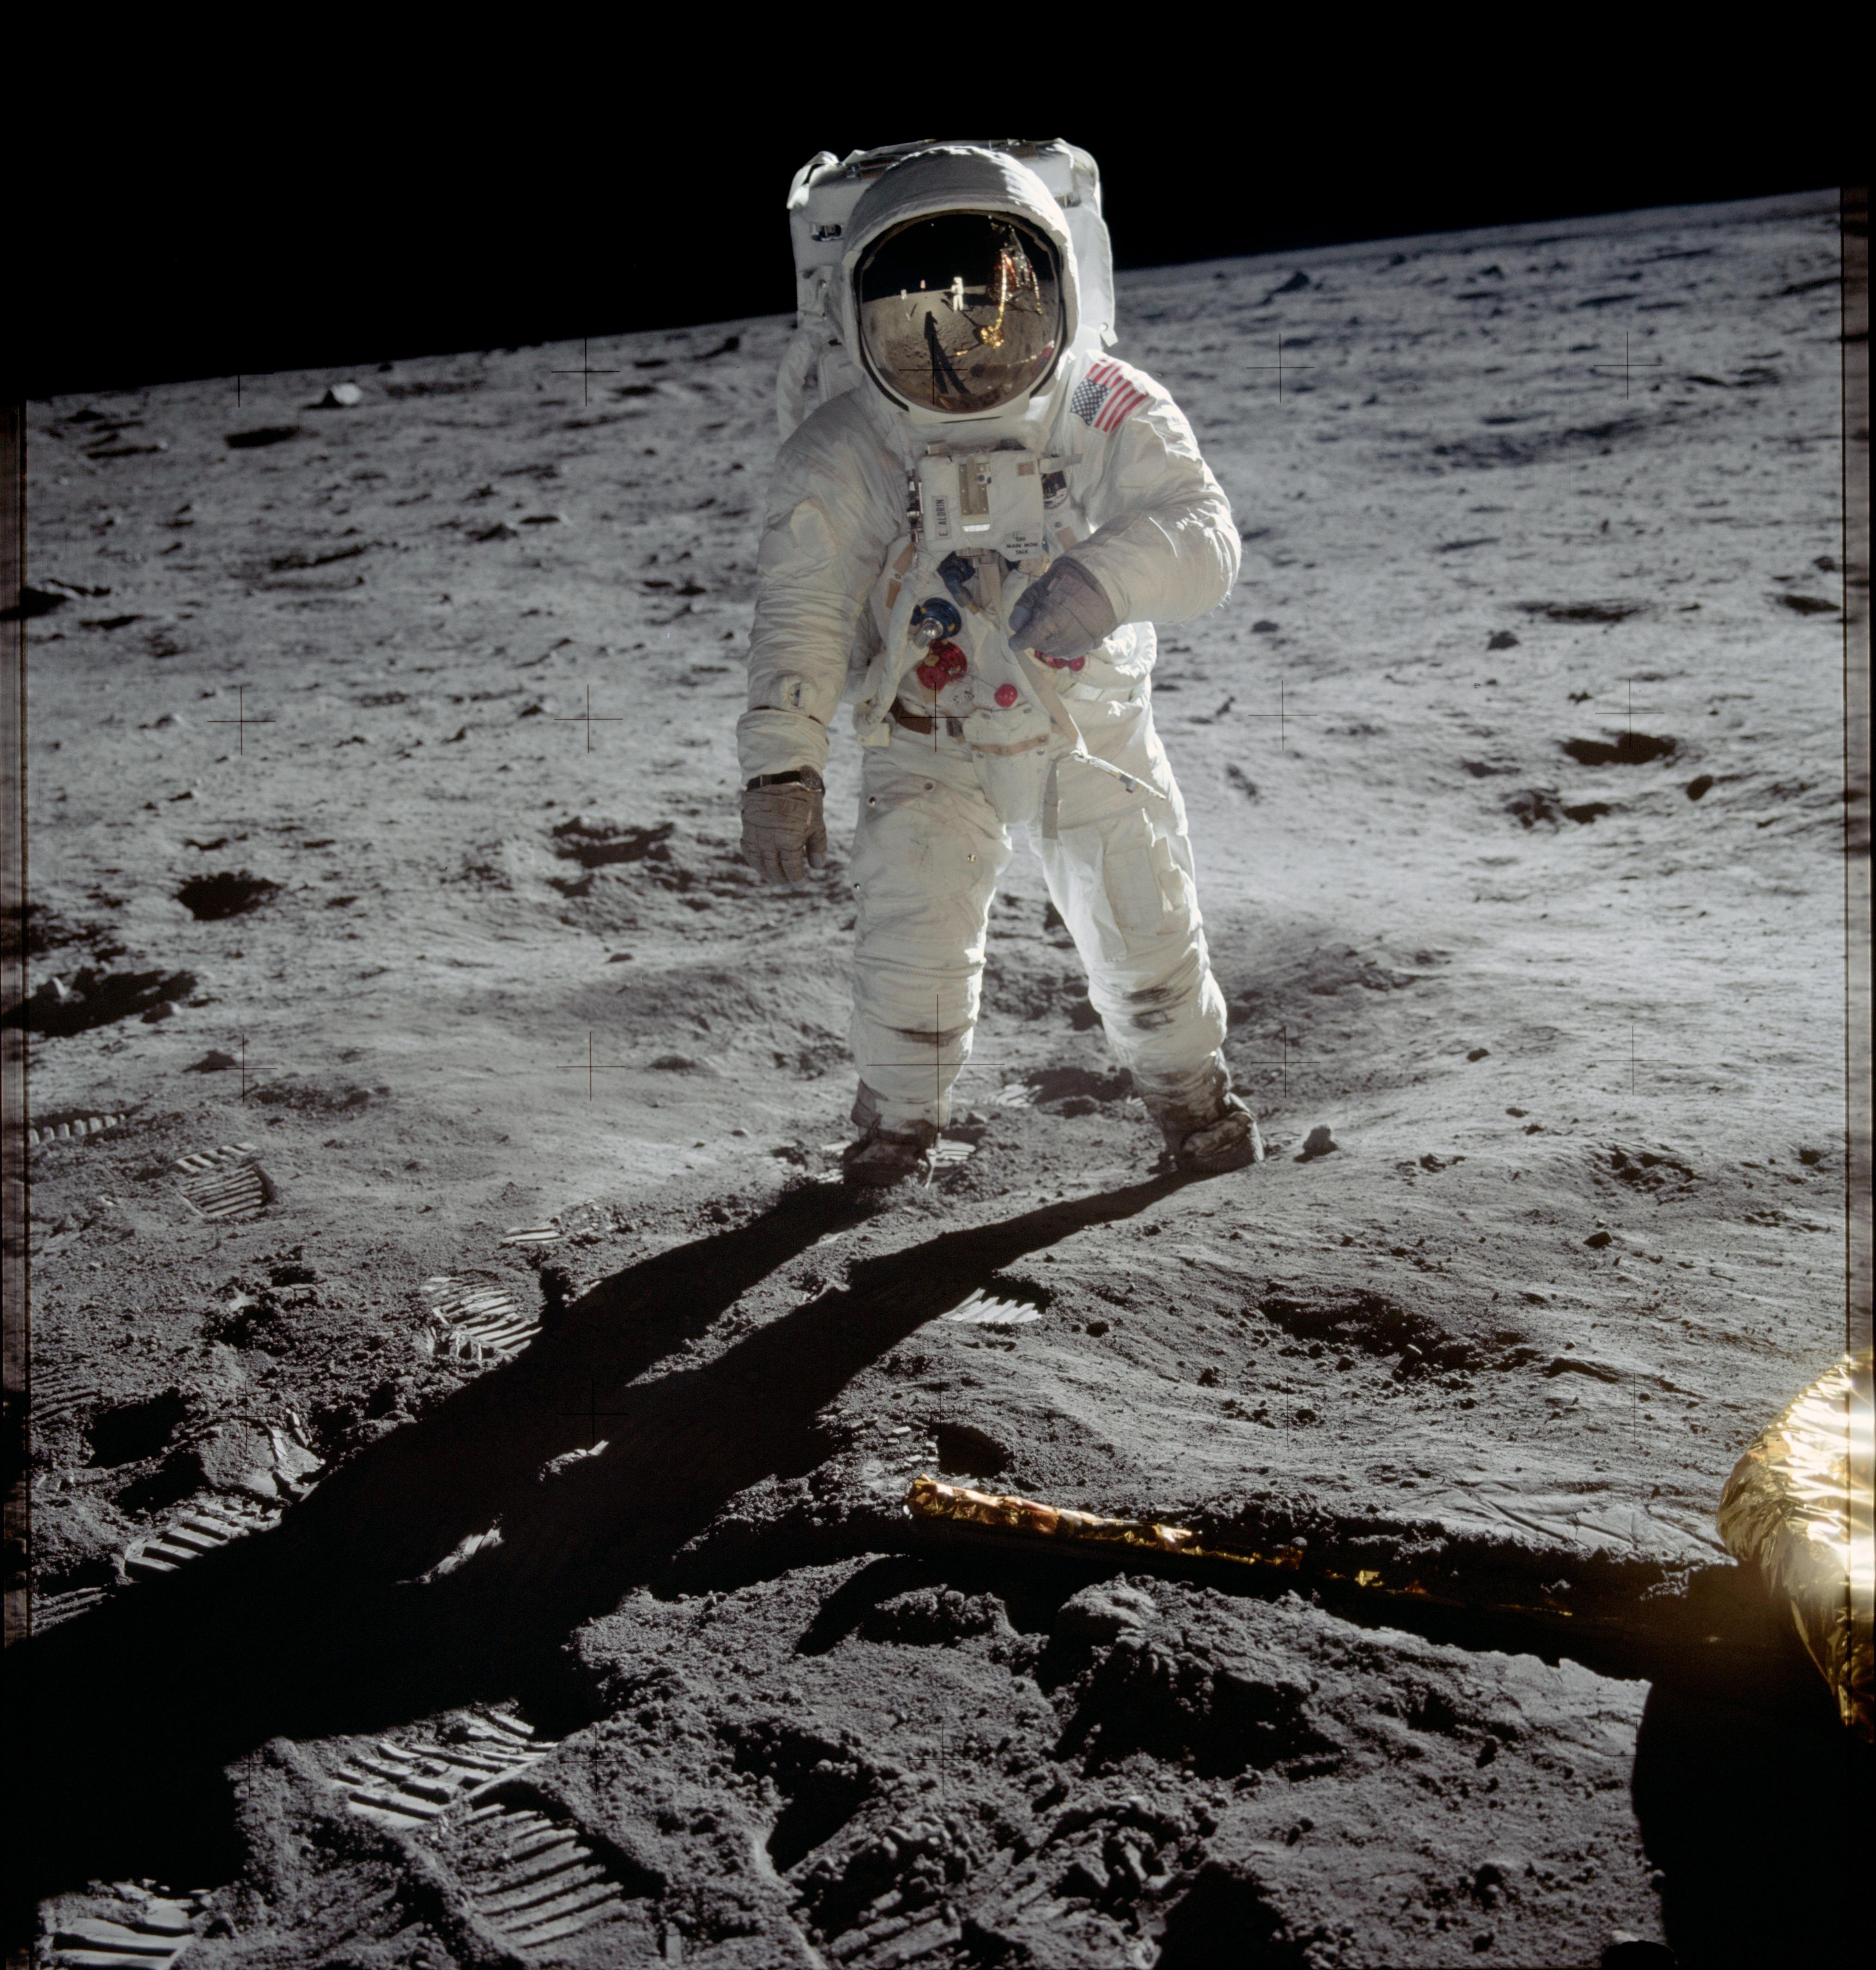 www.planetary.org